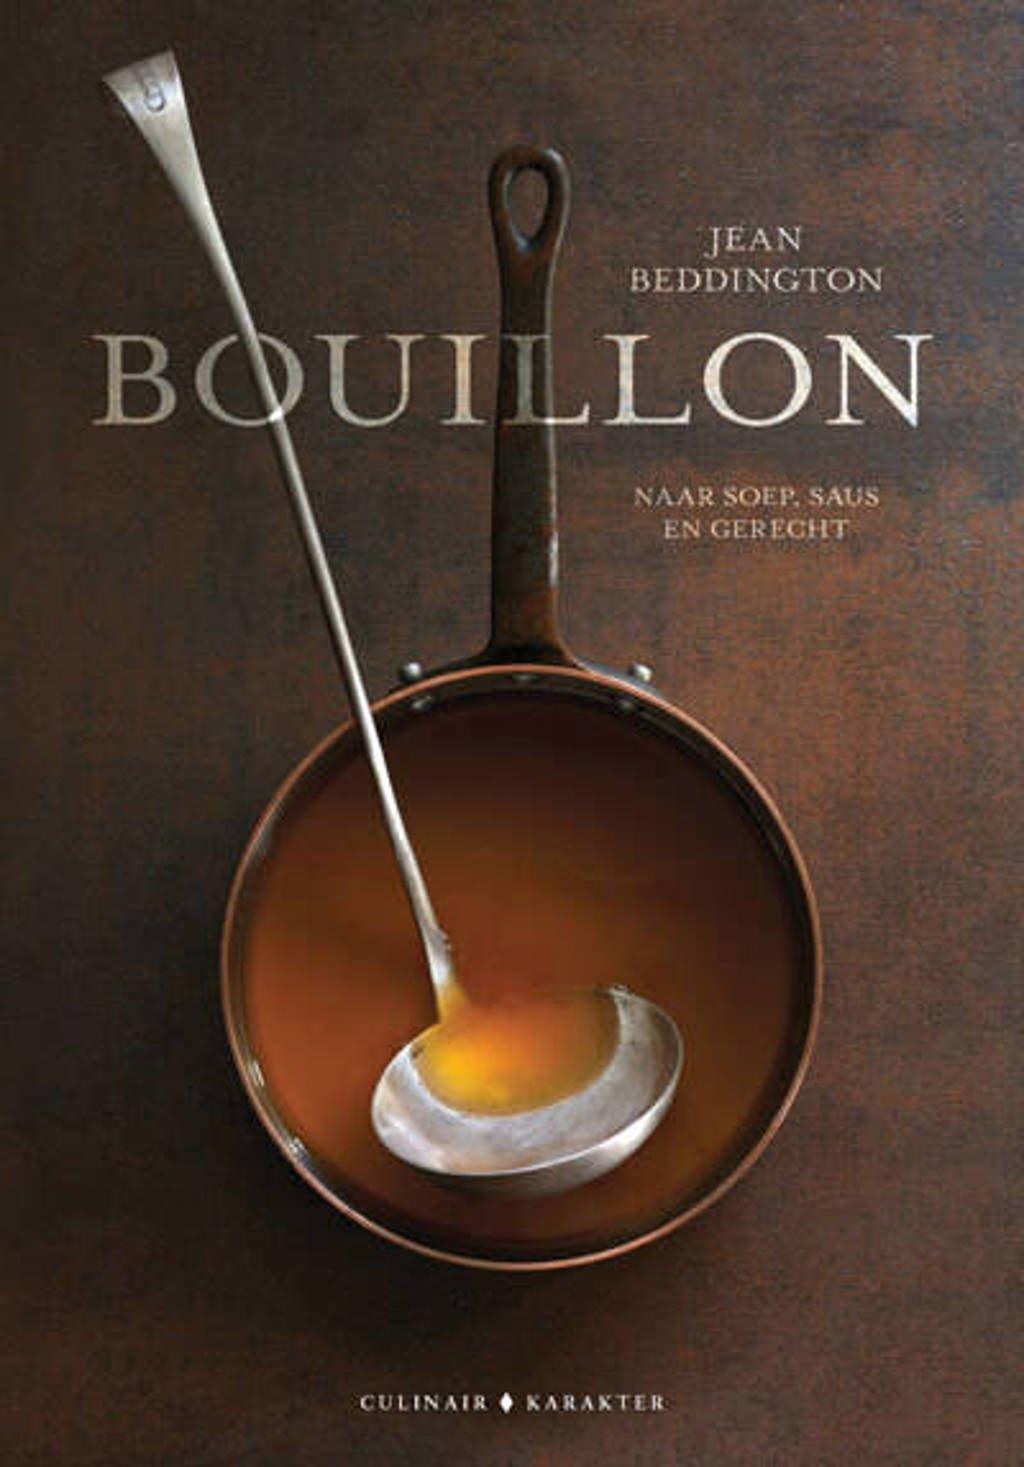 Bouillon - Jean Beddington